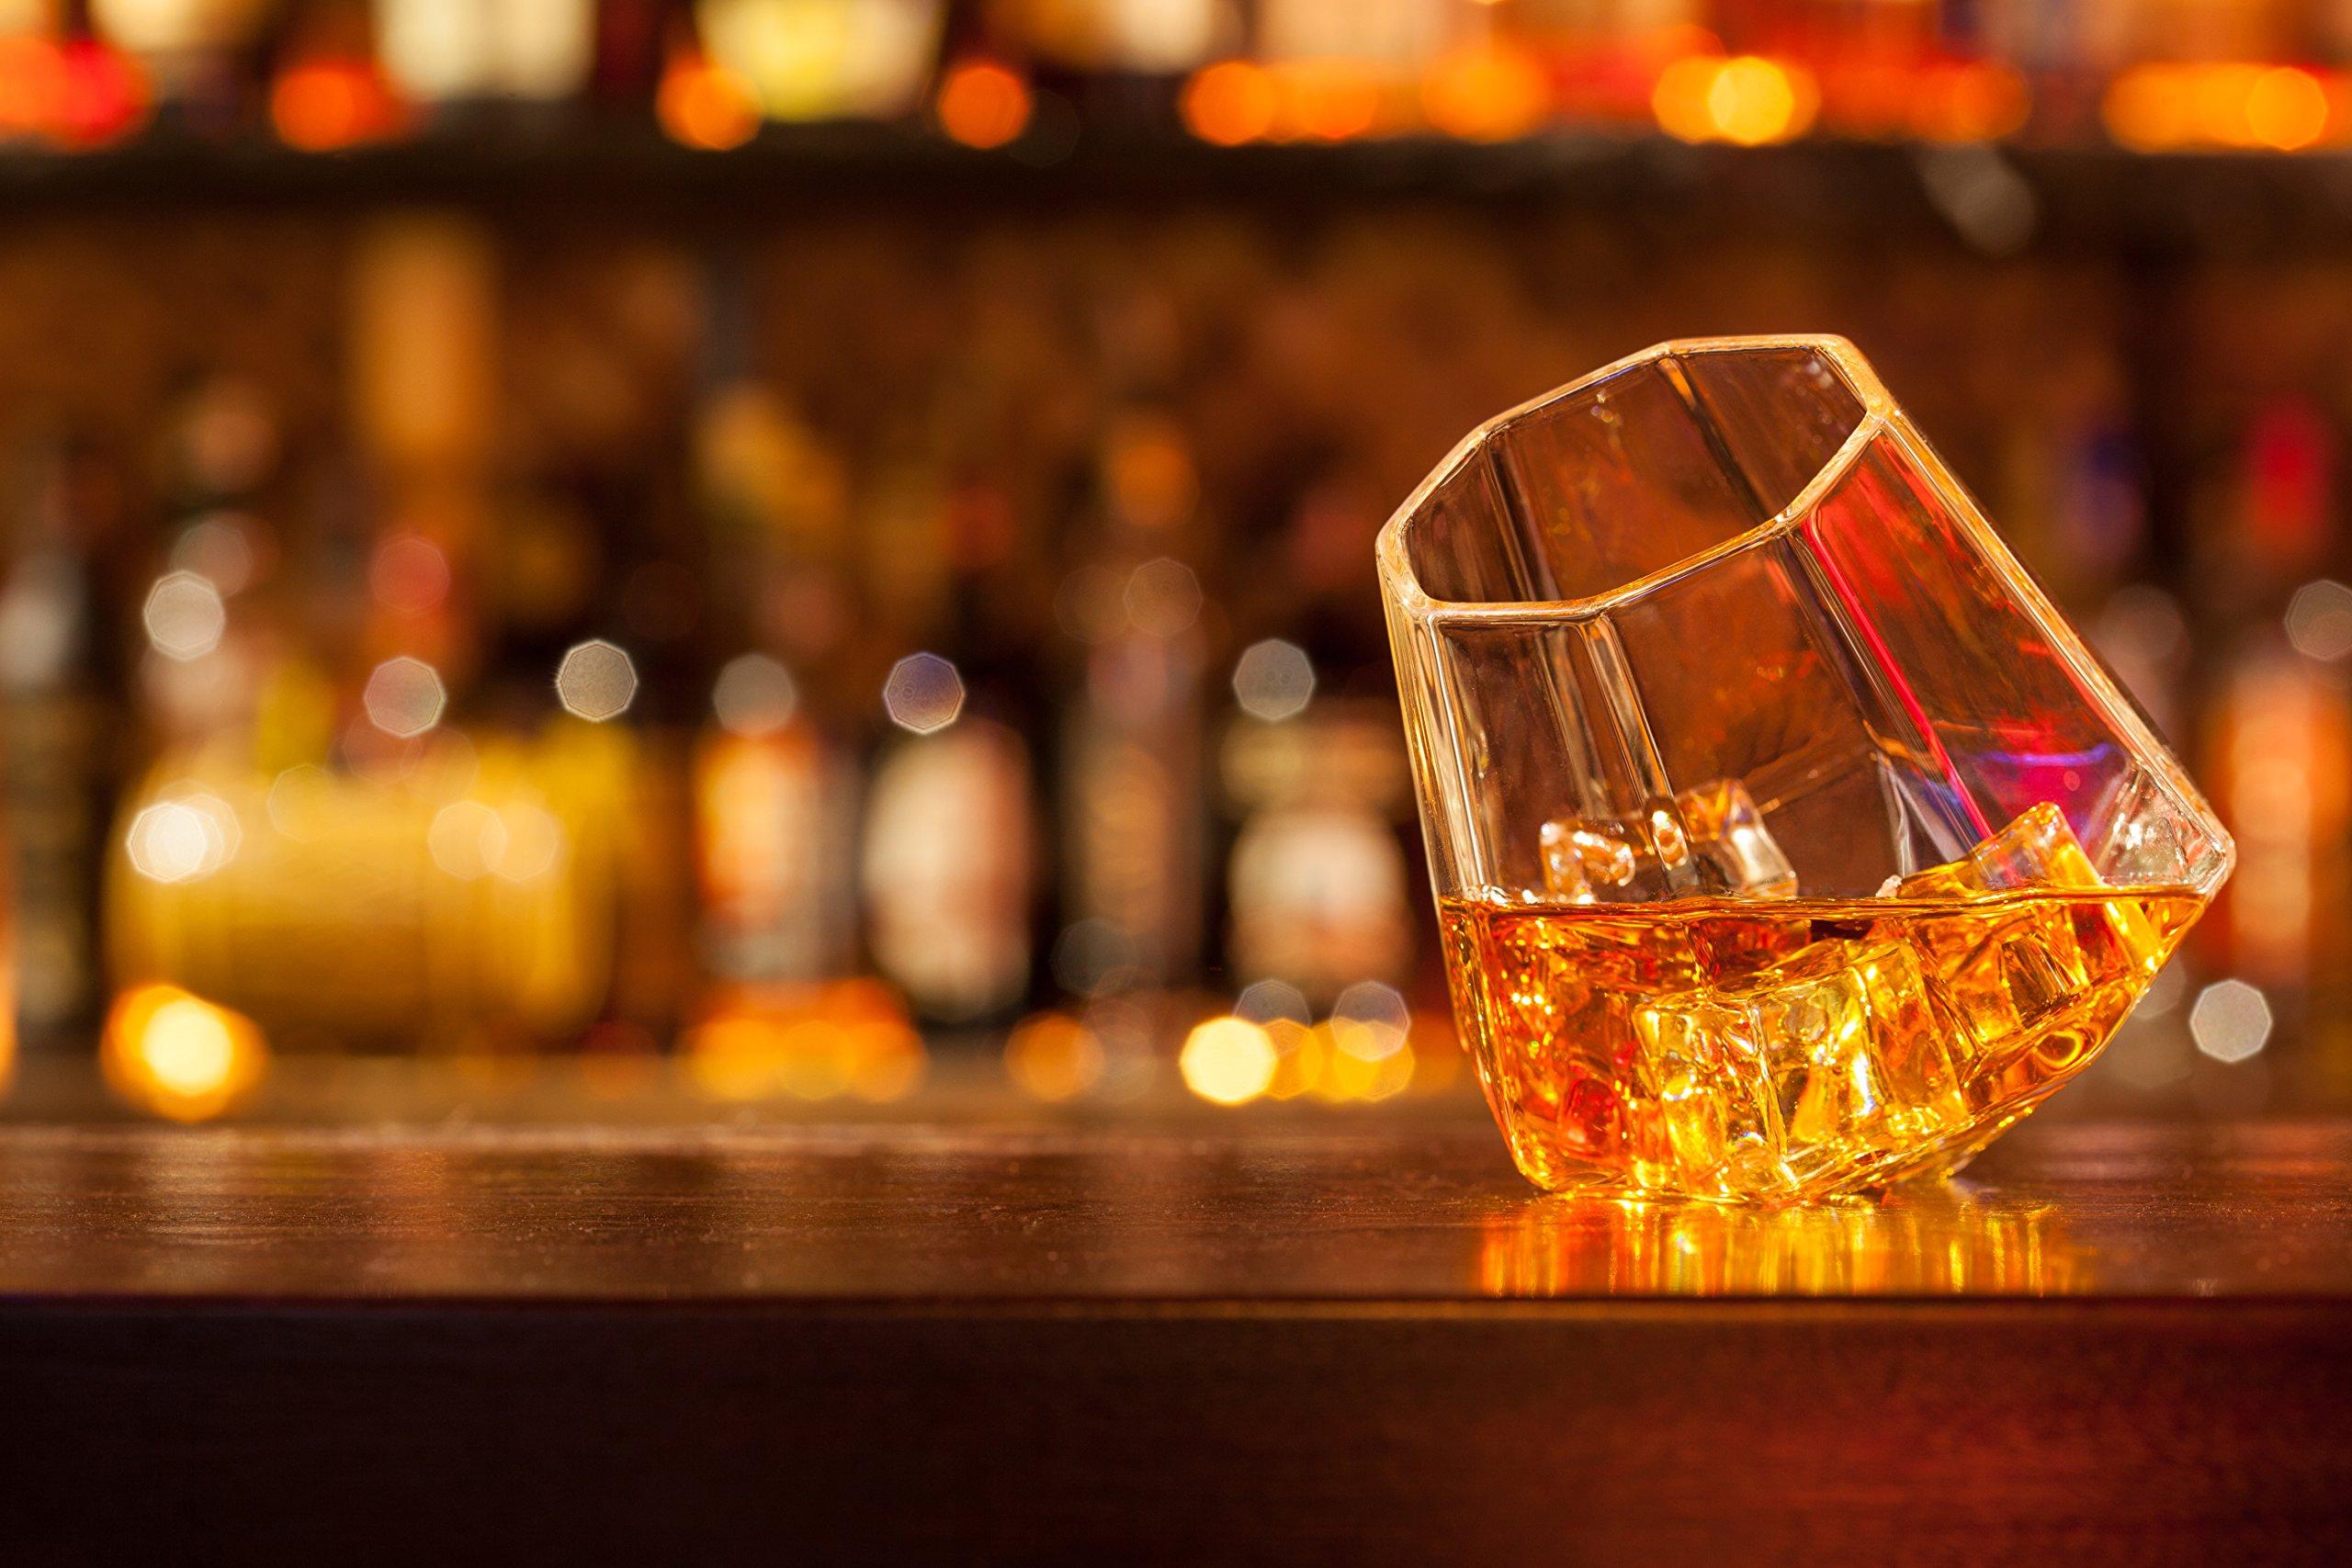 Dragon Glassware Diamond Whiskey Glasses, Premium Designer Tumblers for Spirits and Wine, 10-Ounces, Gift Boxed - Set of 4 by Dragon Glassware (Image #4)